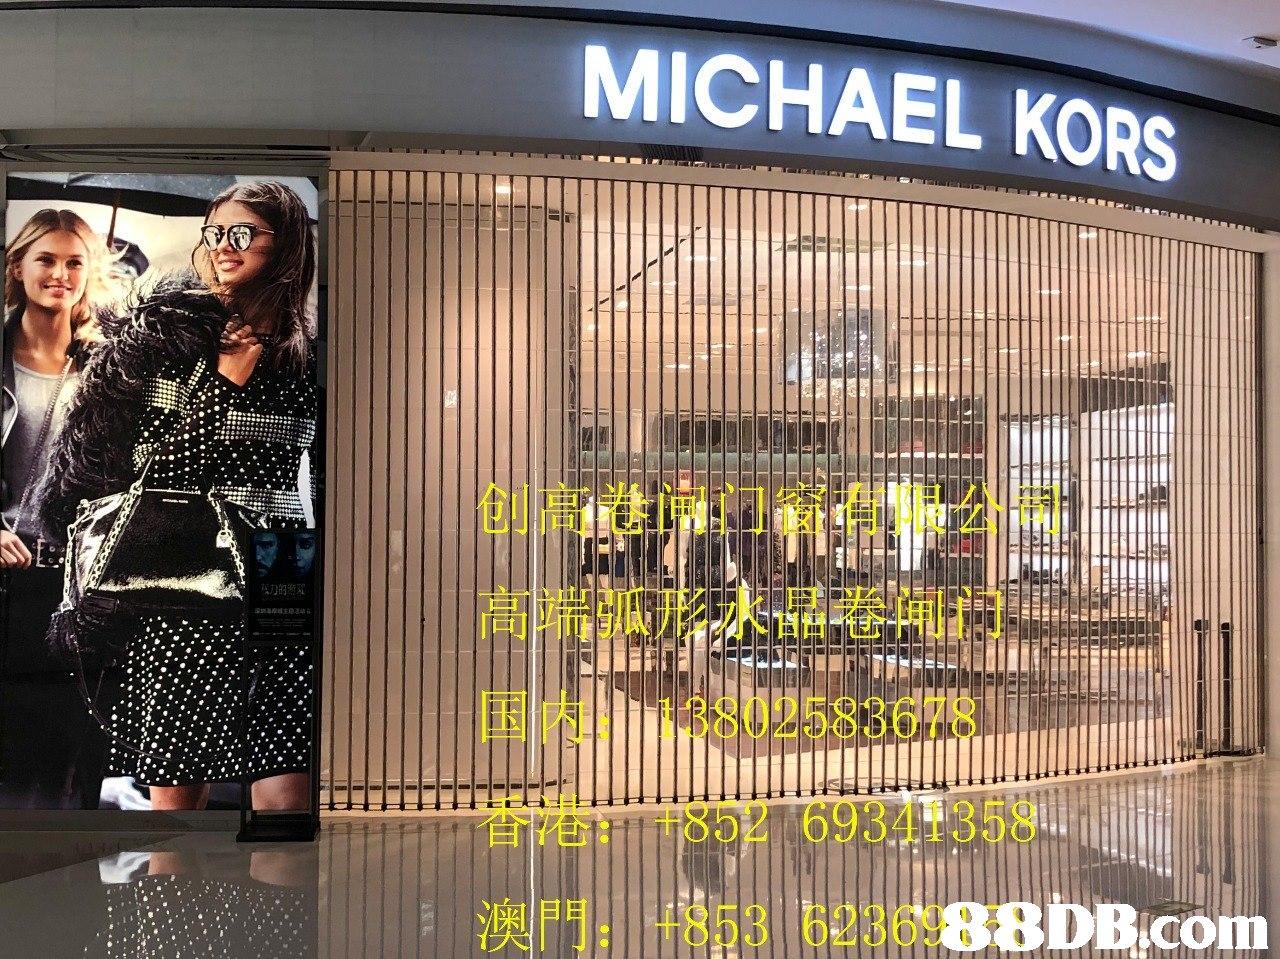 MICHAEL KORS 创高卷闸门窗有限公司 高端弧形水晶卷闸门 国内: 13802583678 香港: +852 6934 1358 澳門: +853 623691   display window,